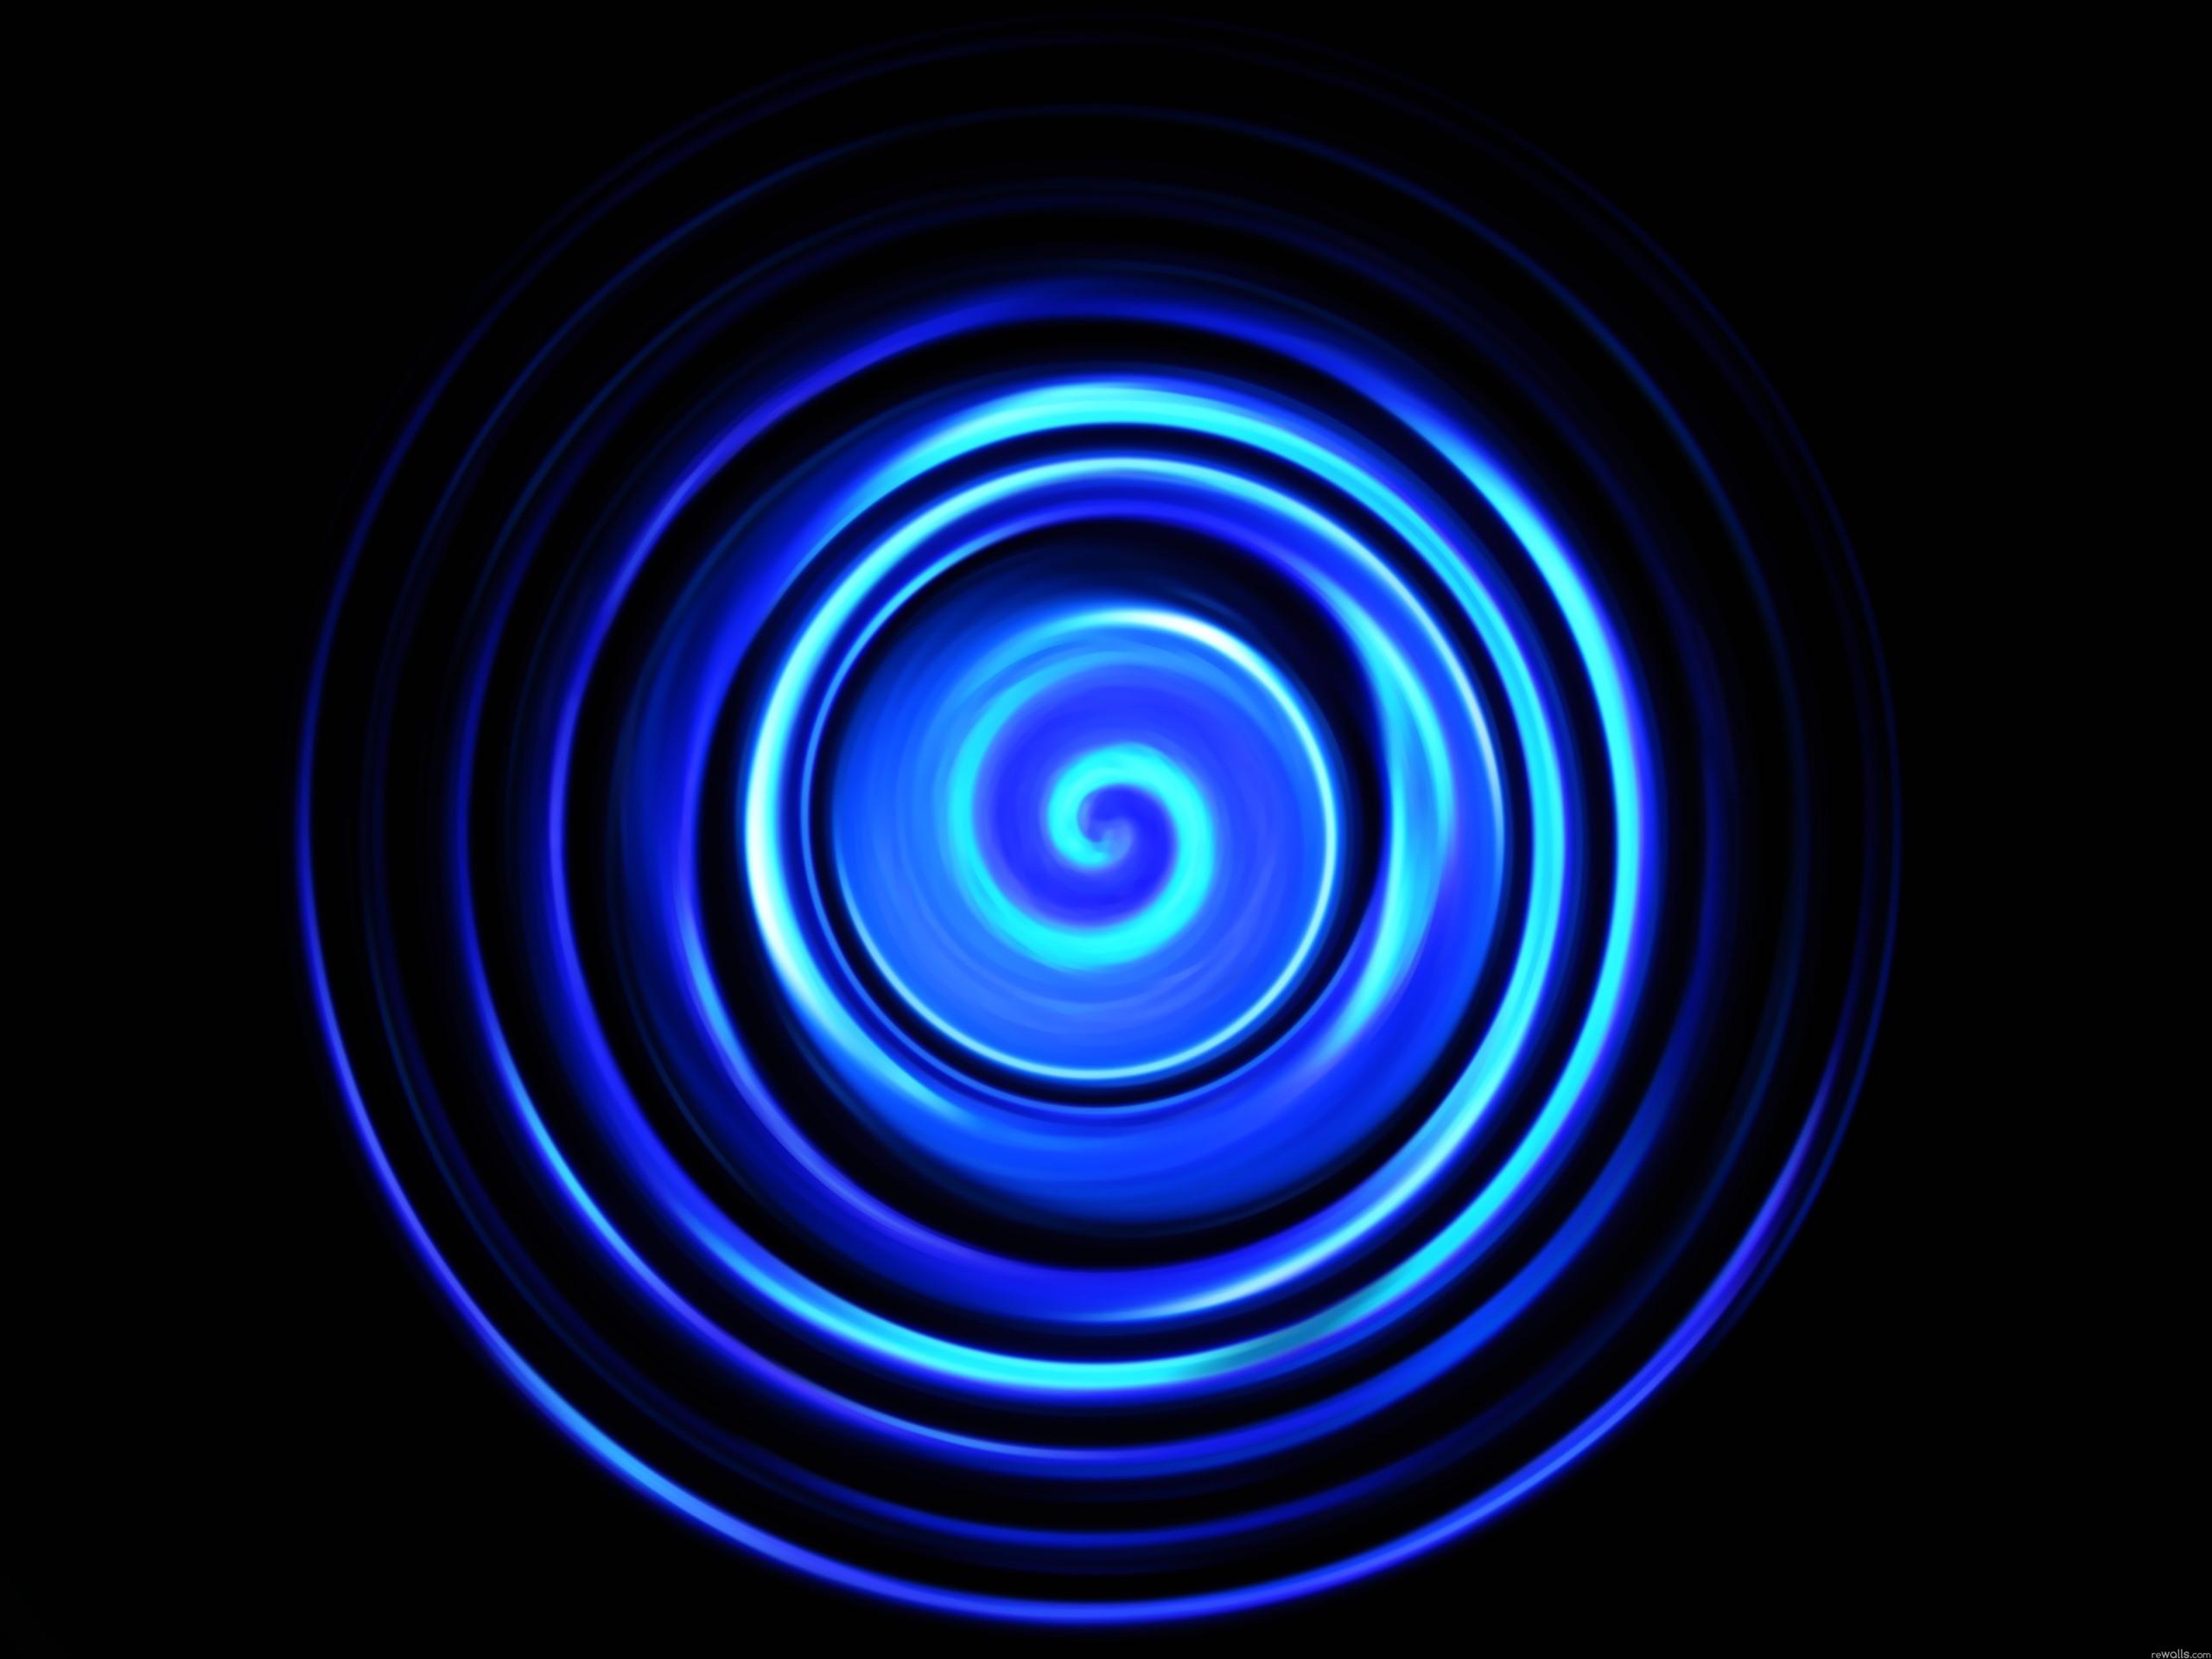 Blue Spirals Wallpapers: Wallpaper Blue Abstract Spiral, Black Background 3840x2160